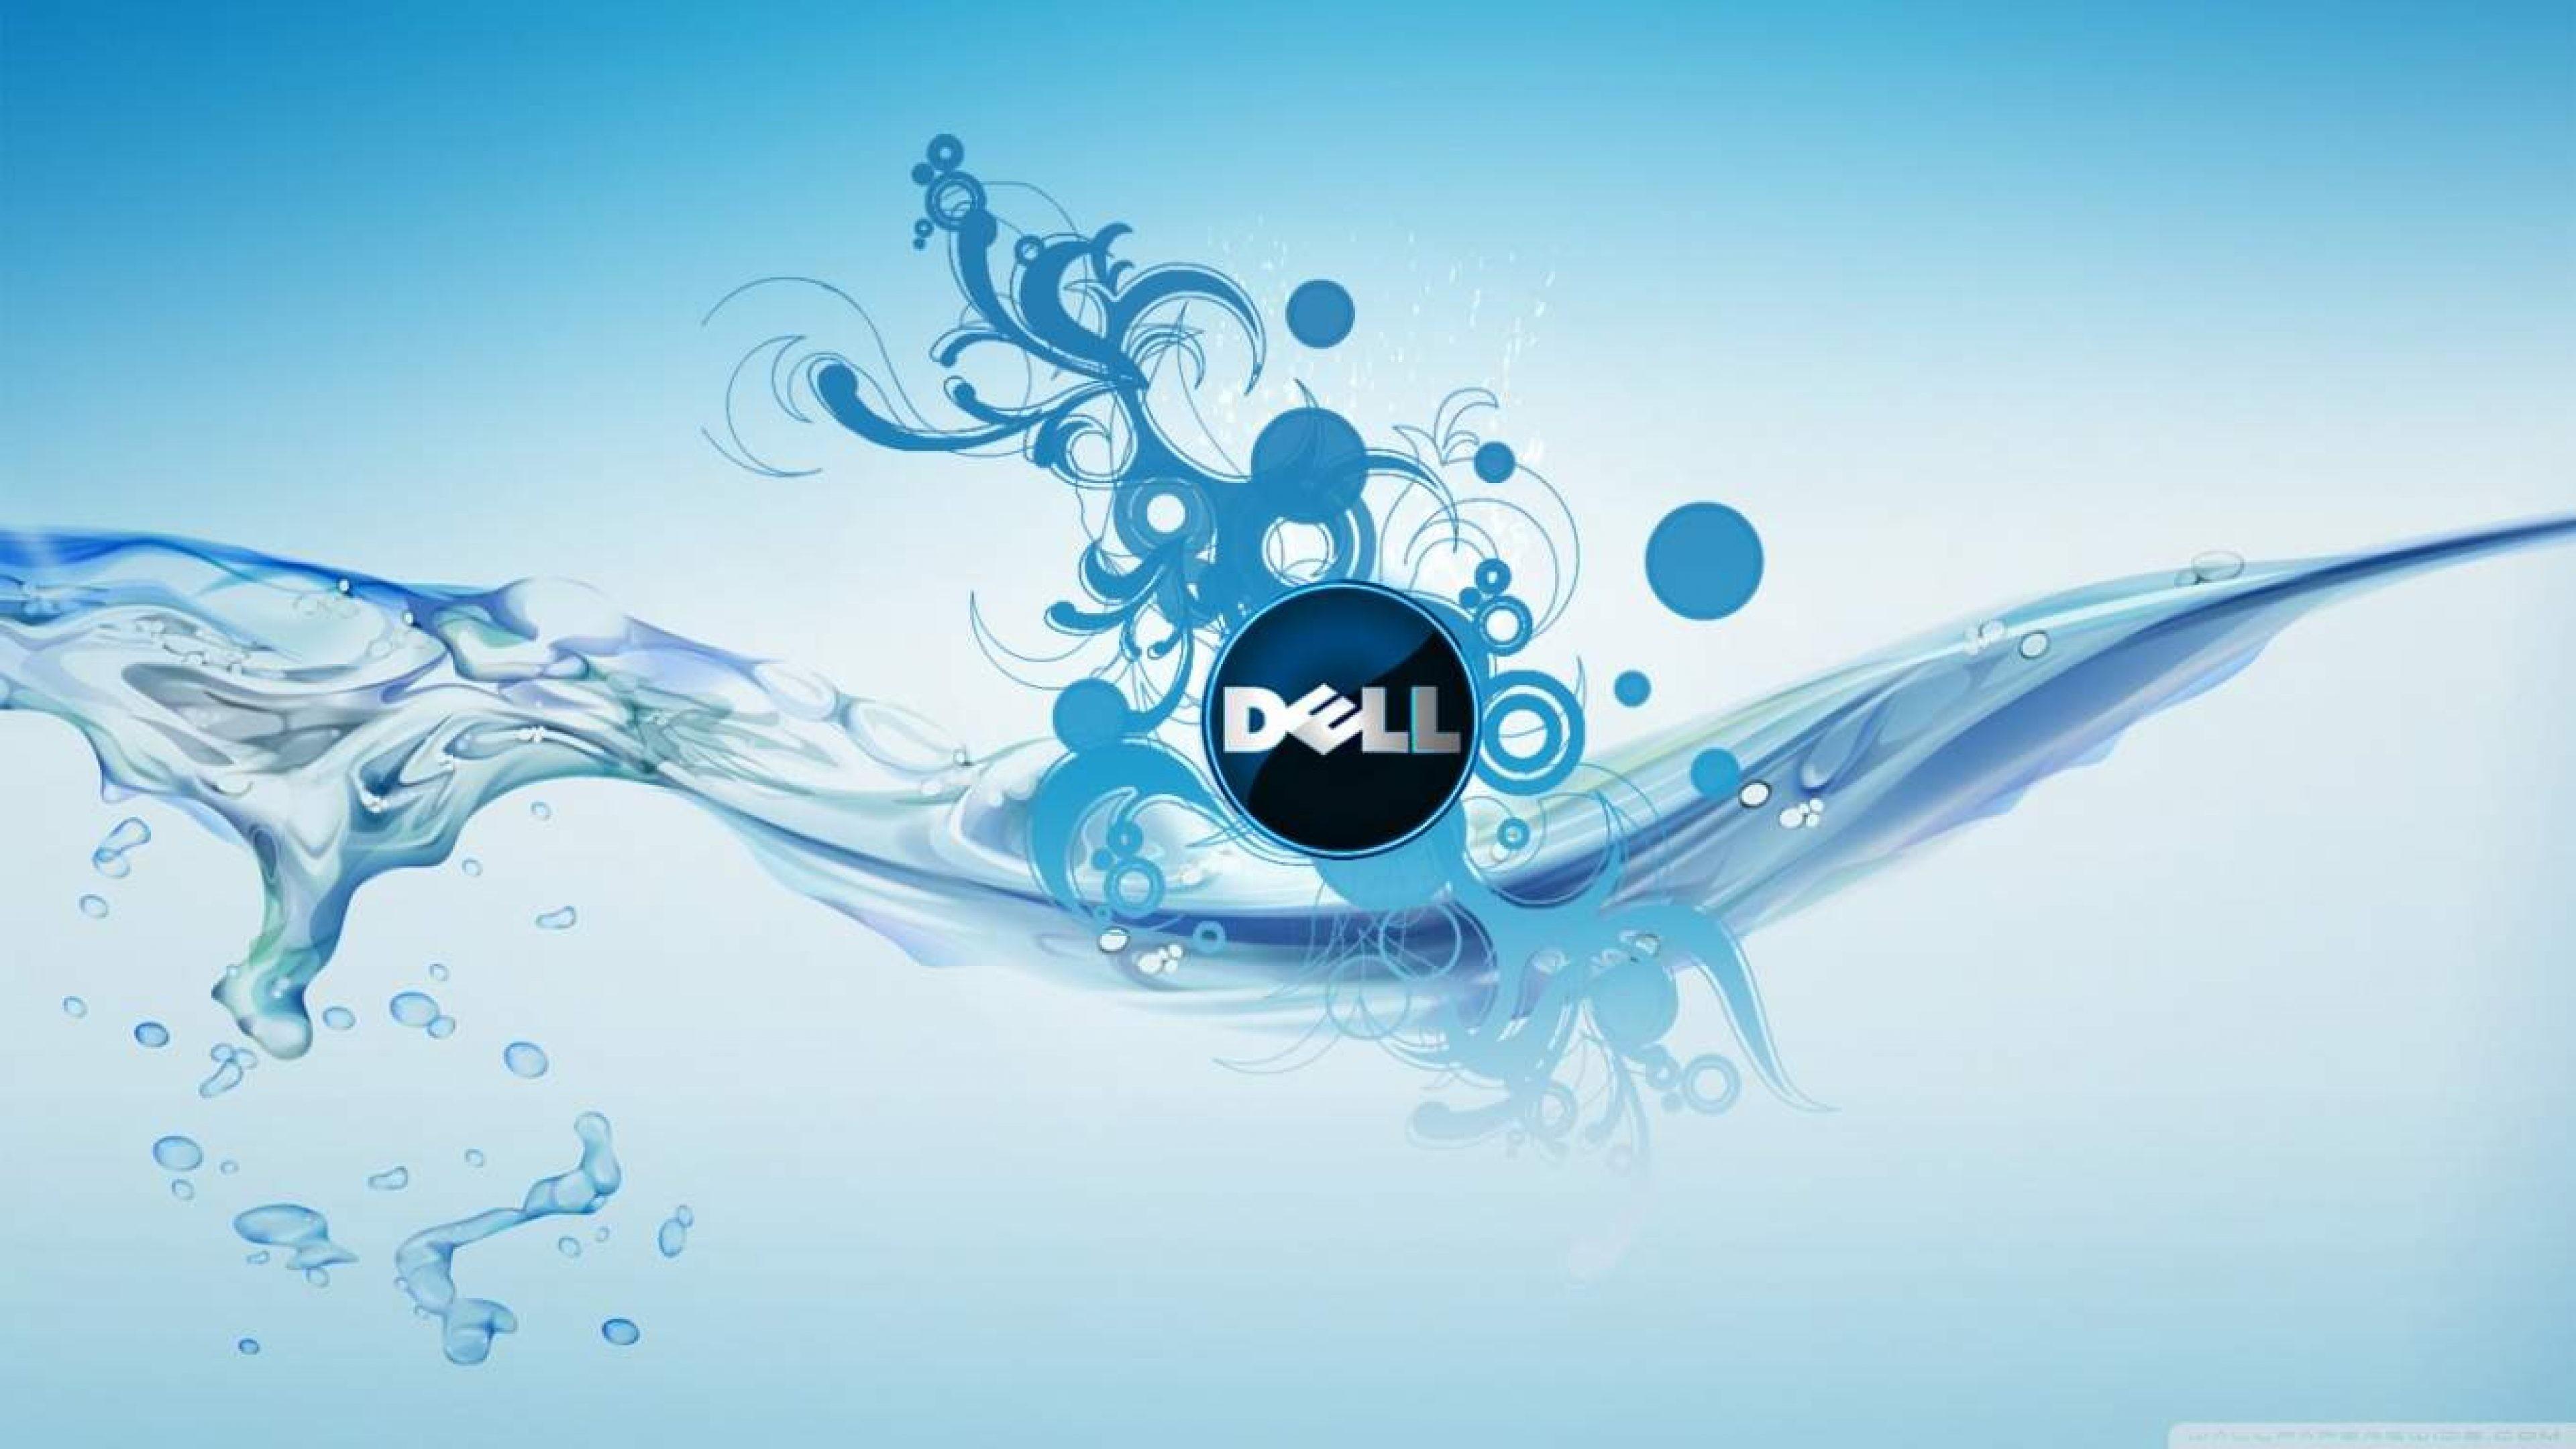 Dell Desktop Background 60 Pictures